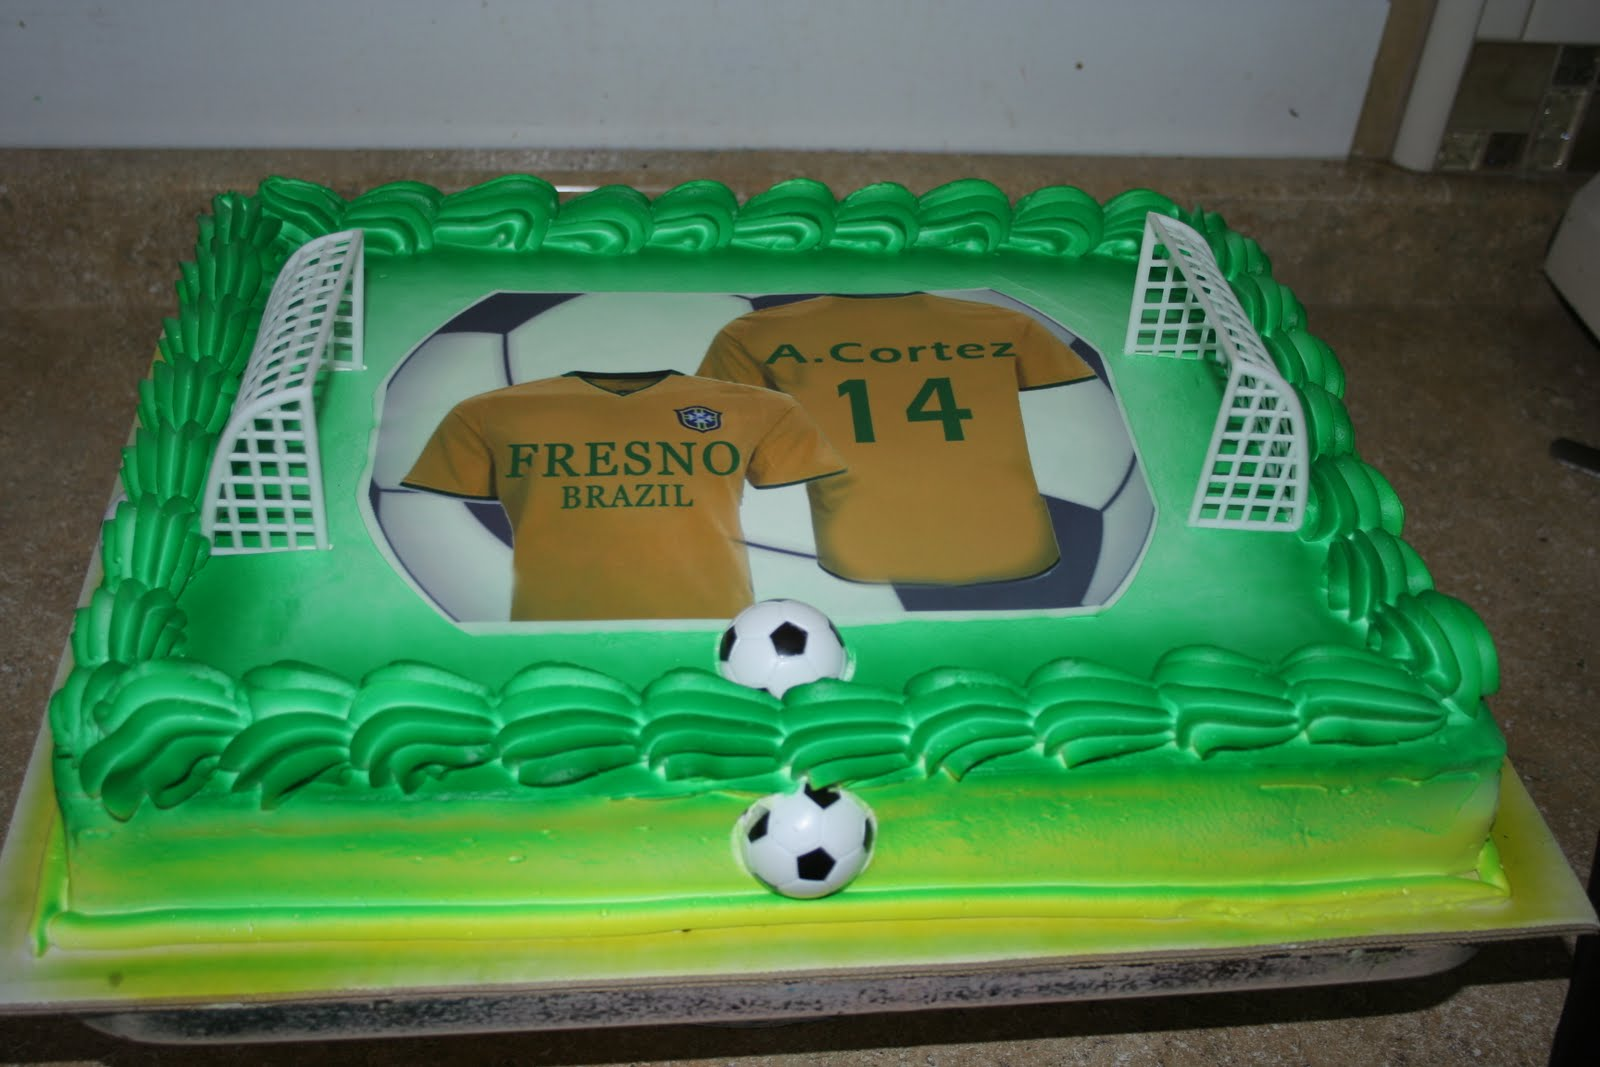 Hectors Custom Cakes Fresno Brazil Soccer Team